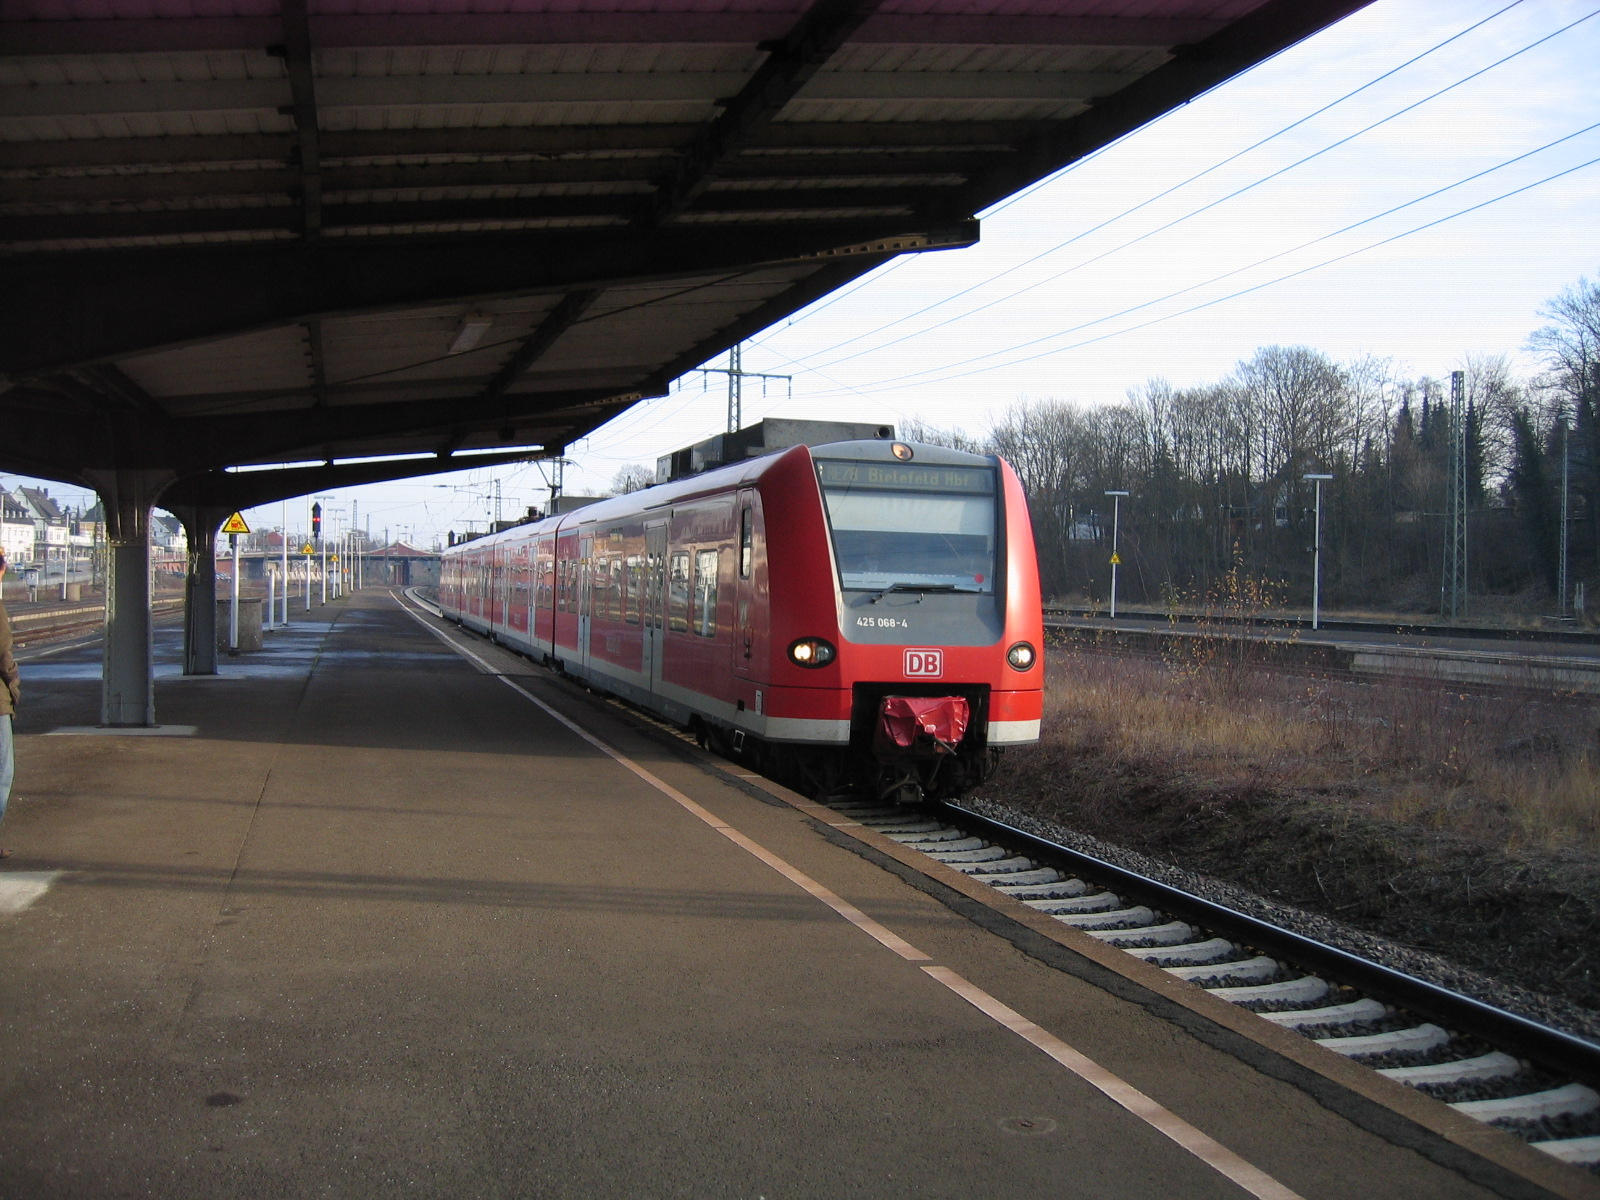 Bahnhof Löhne file löhne bahnhof porta express 2009 12 16 26 jpg wikimedia commons